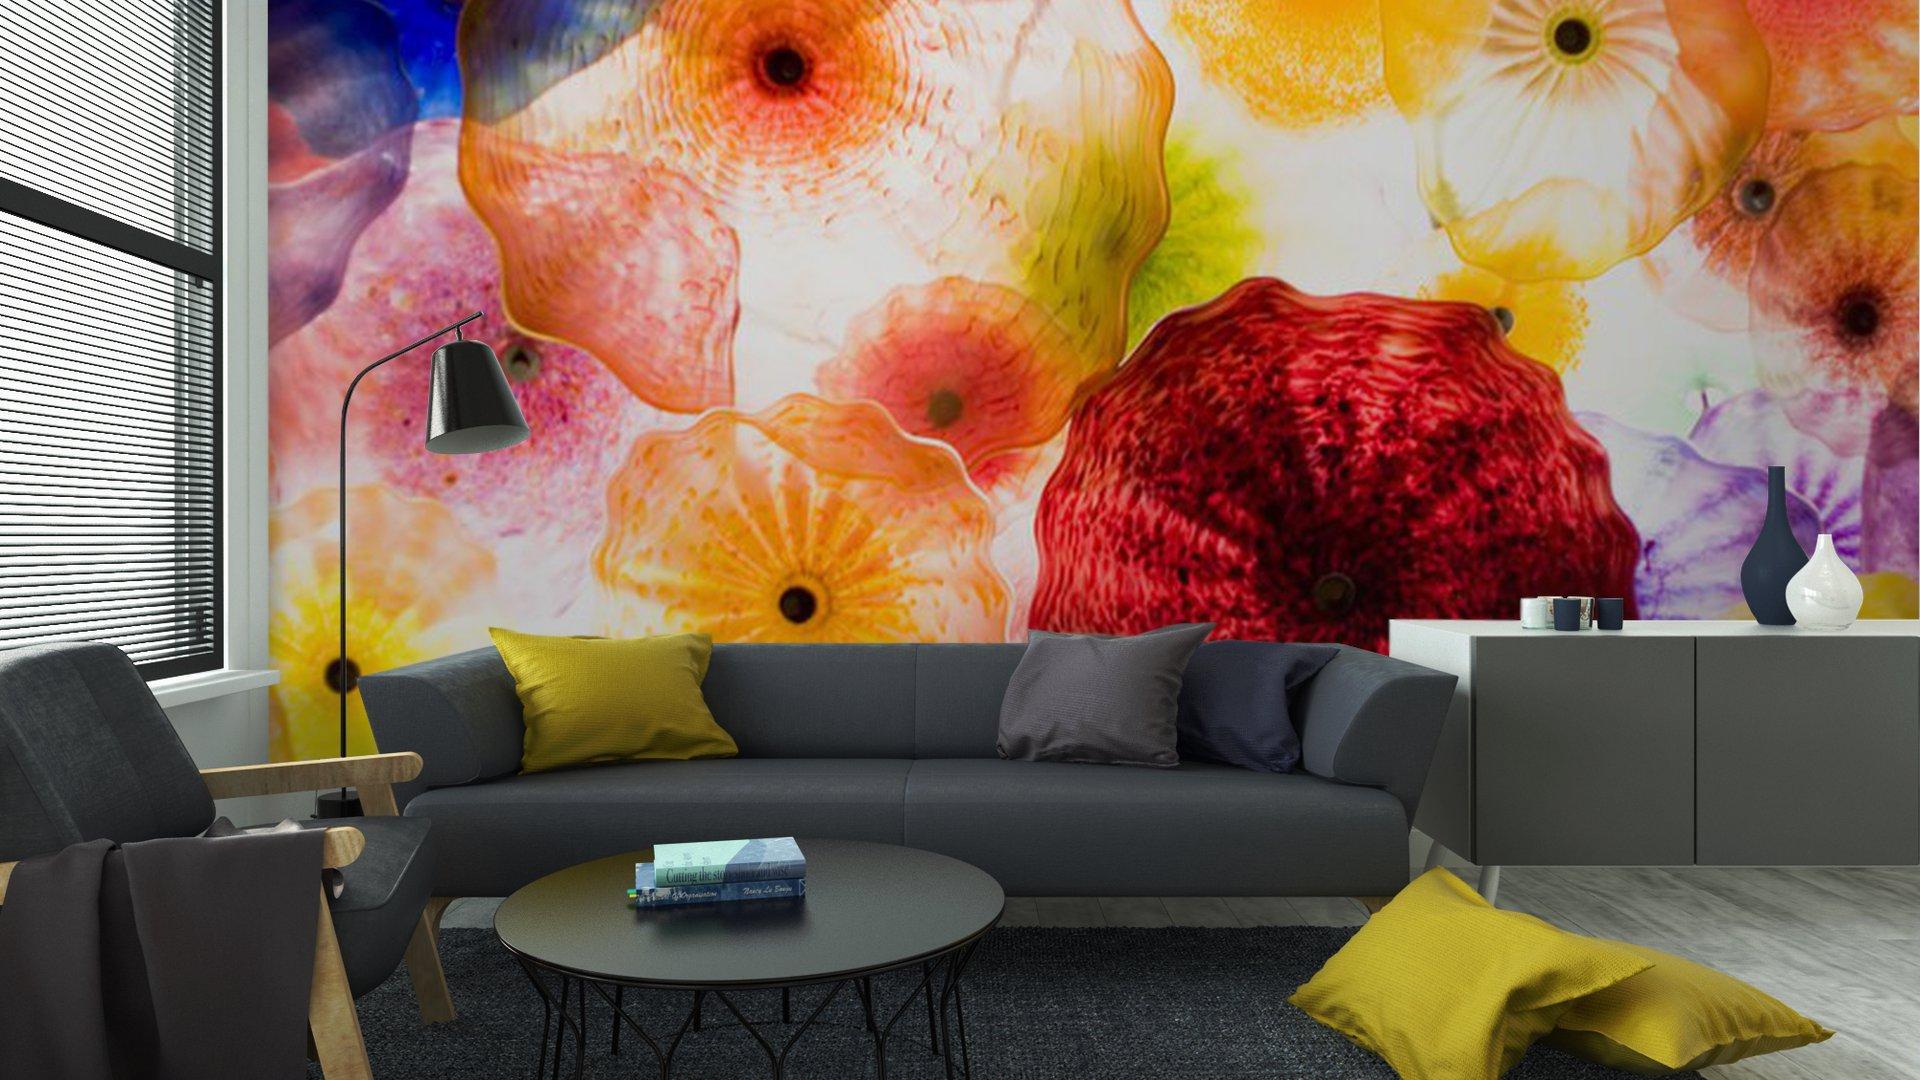 ARTE EN VIDRIO7 - Fotomural Tapiz Patrón Floral 01